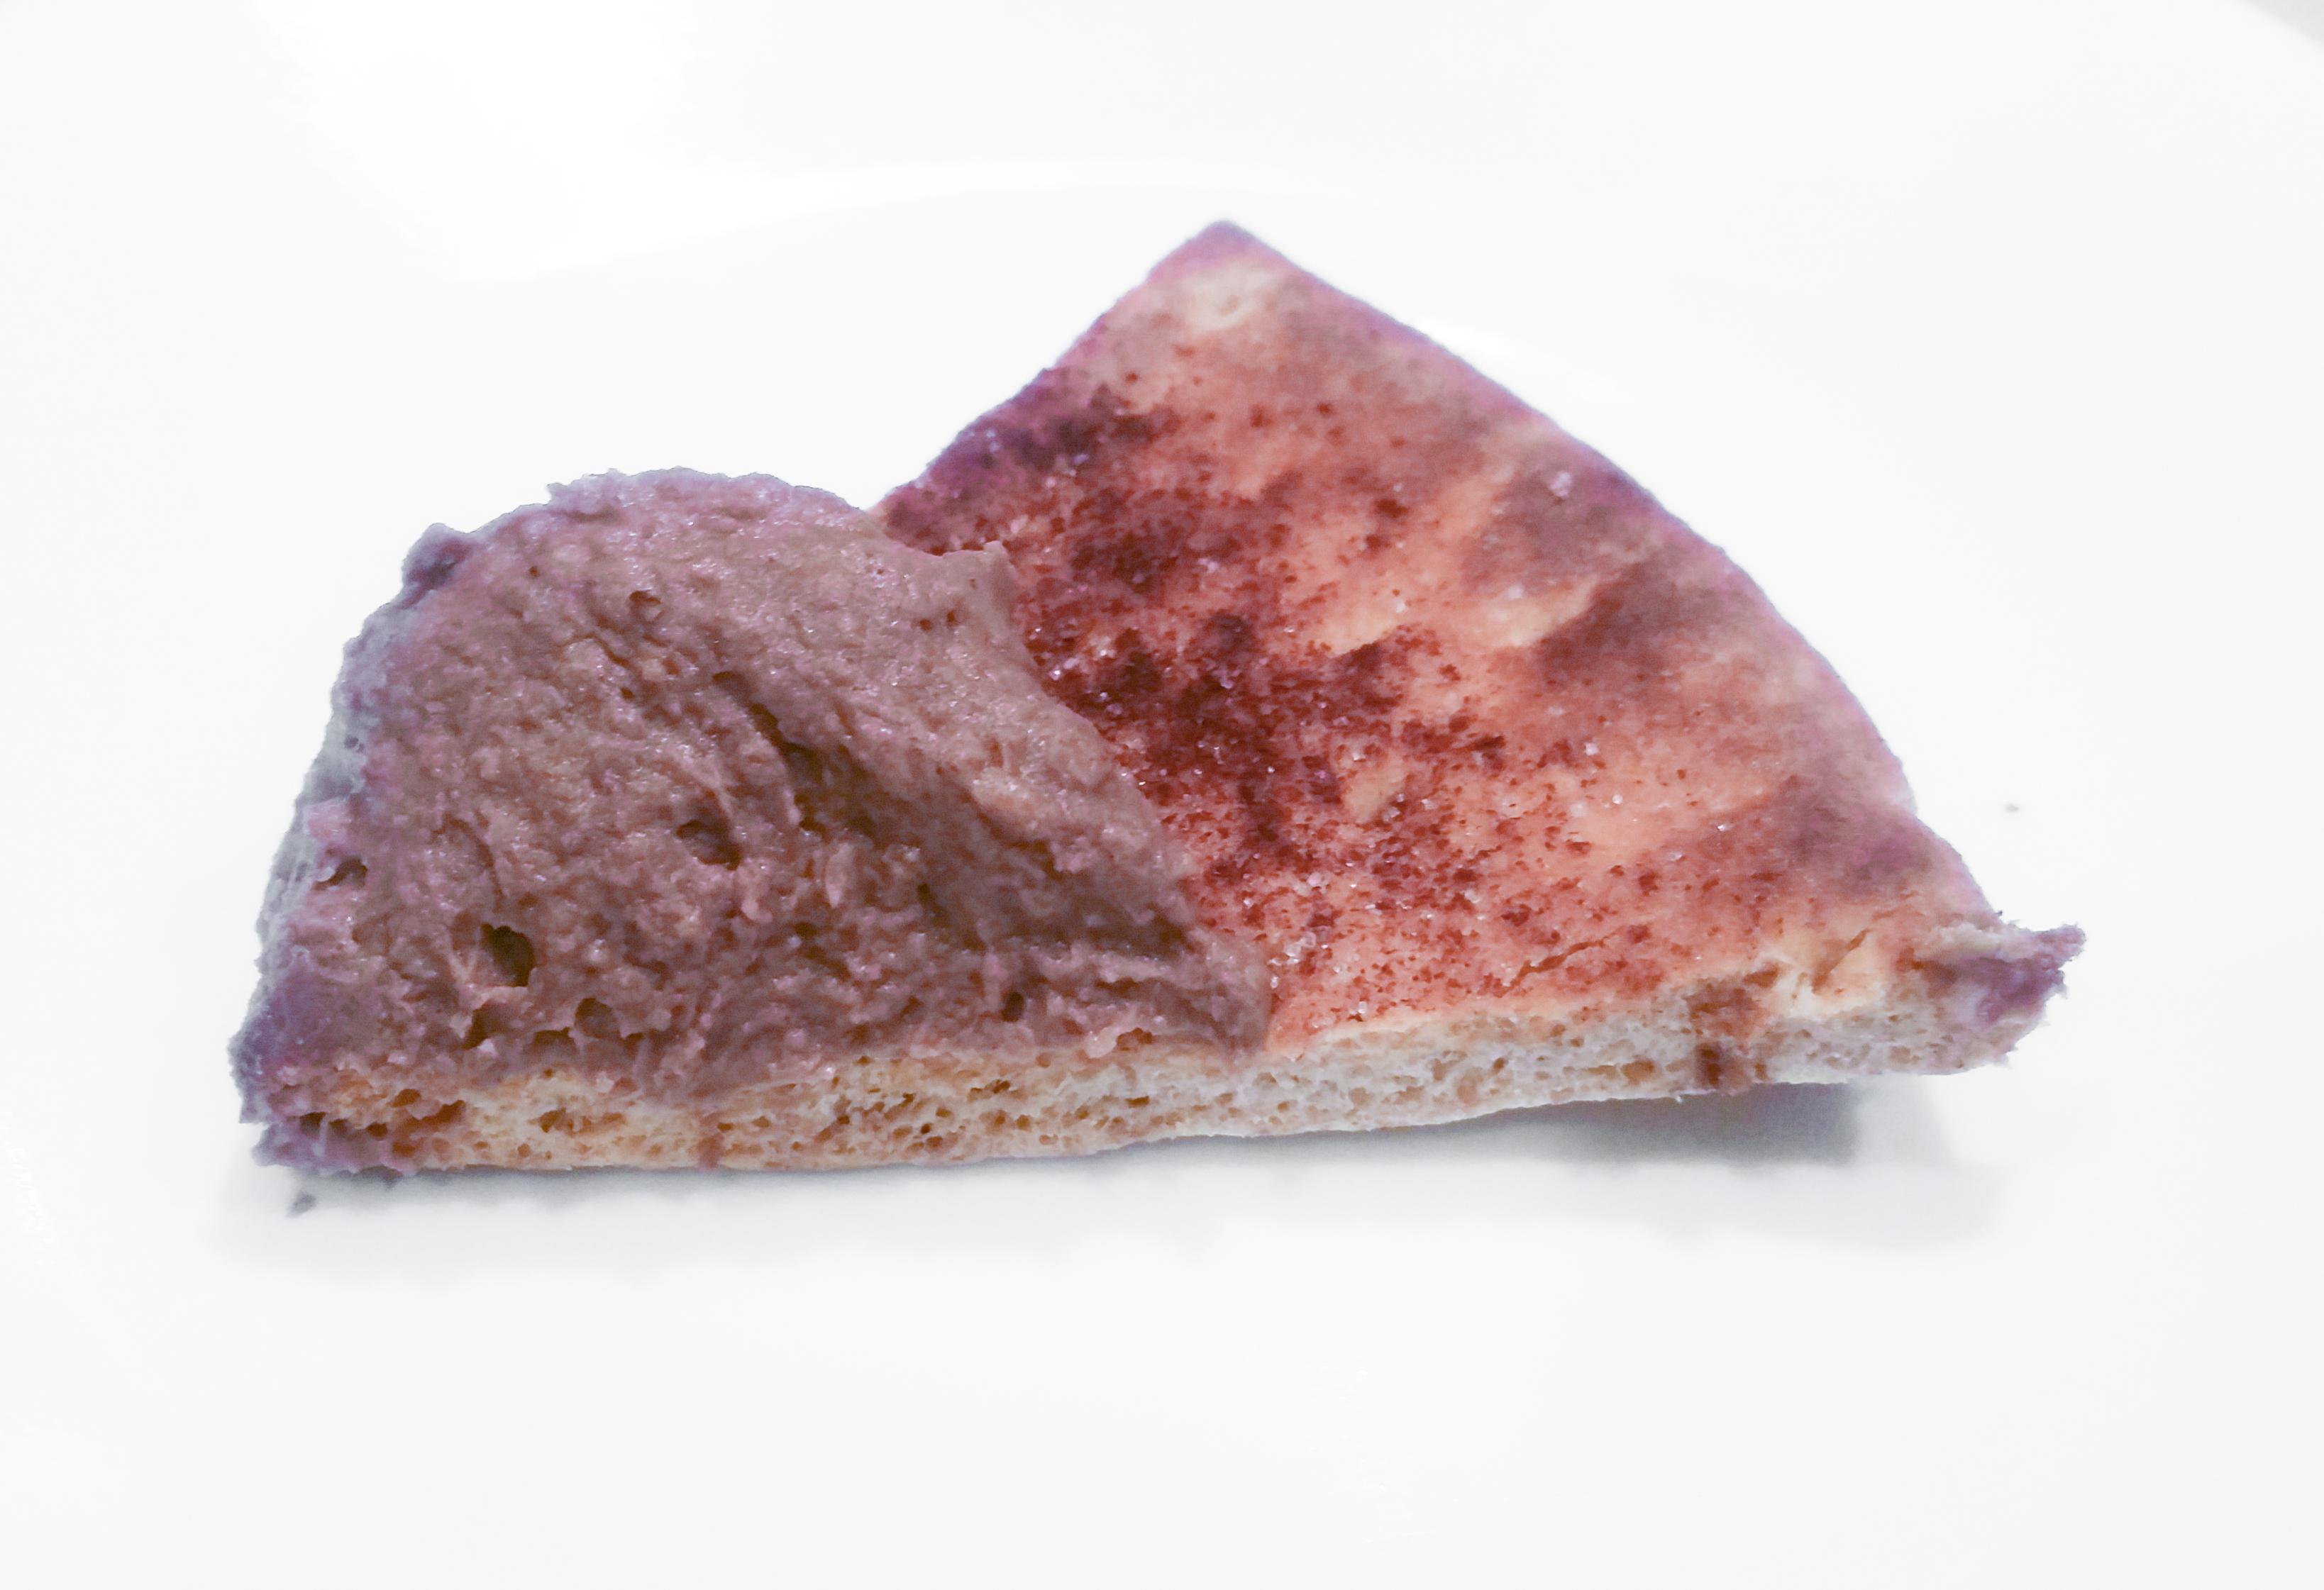 Peanut Butter-Chocolate Hummus